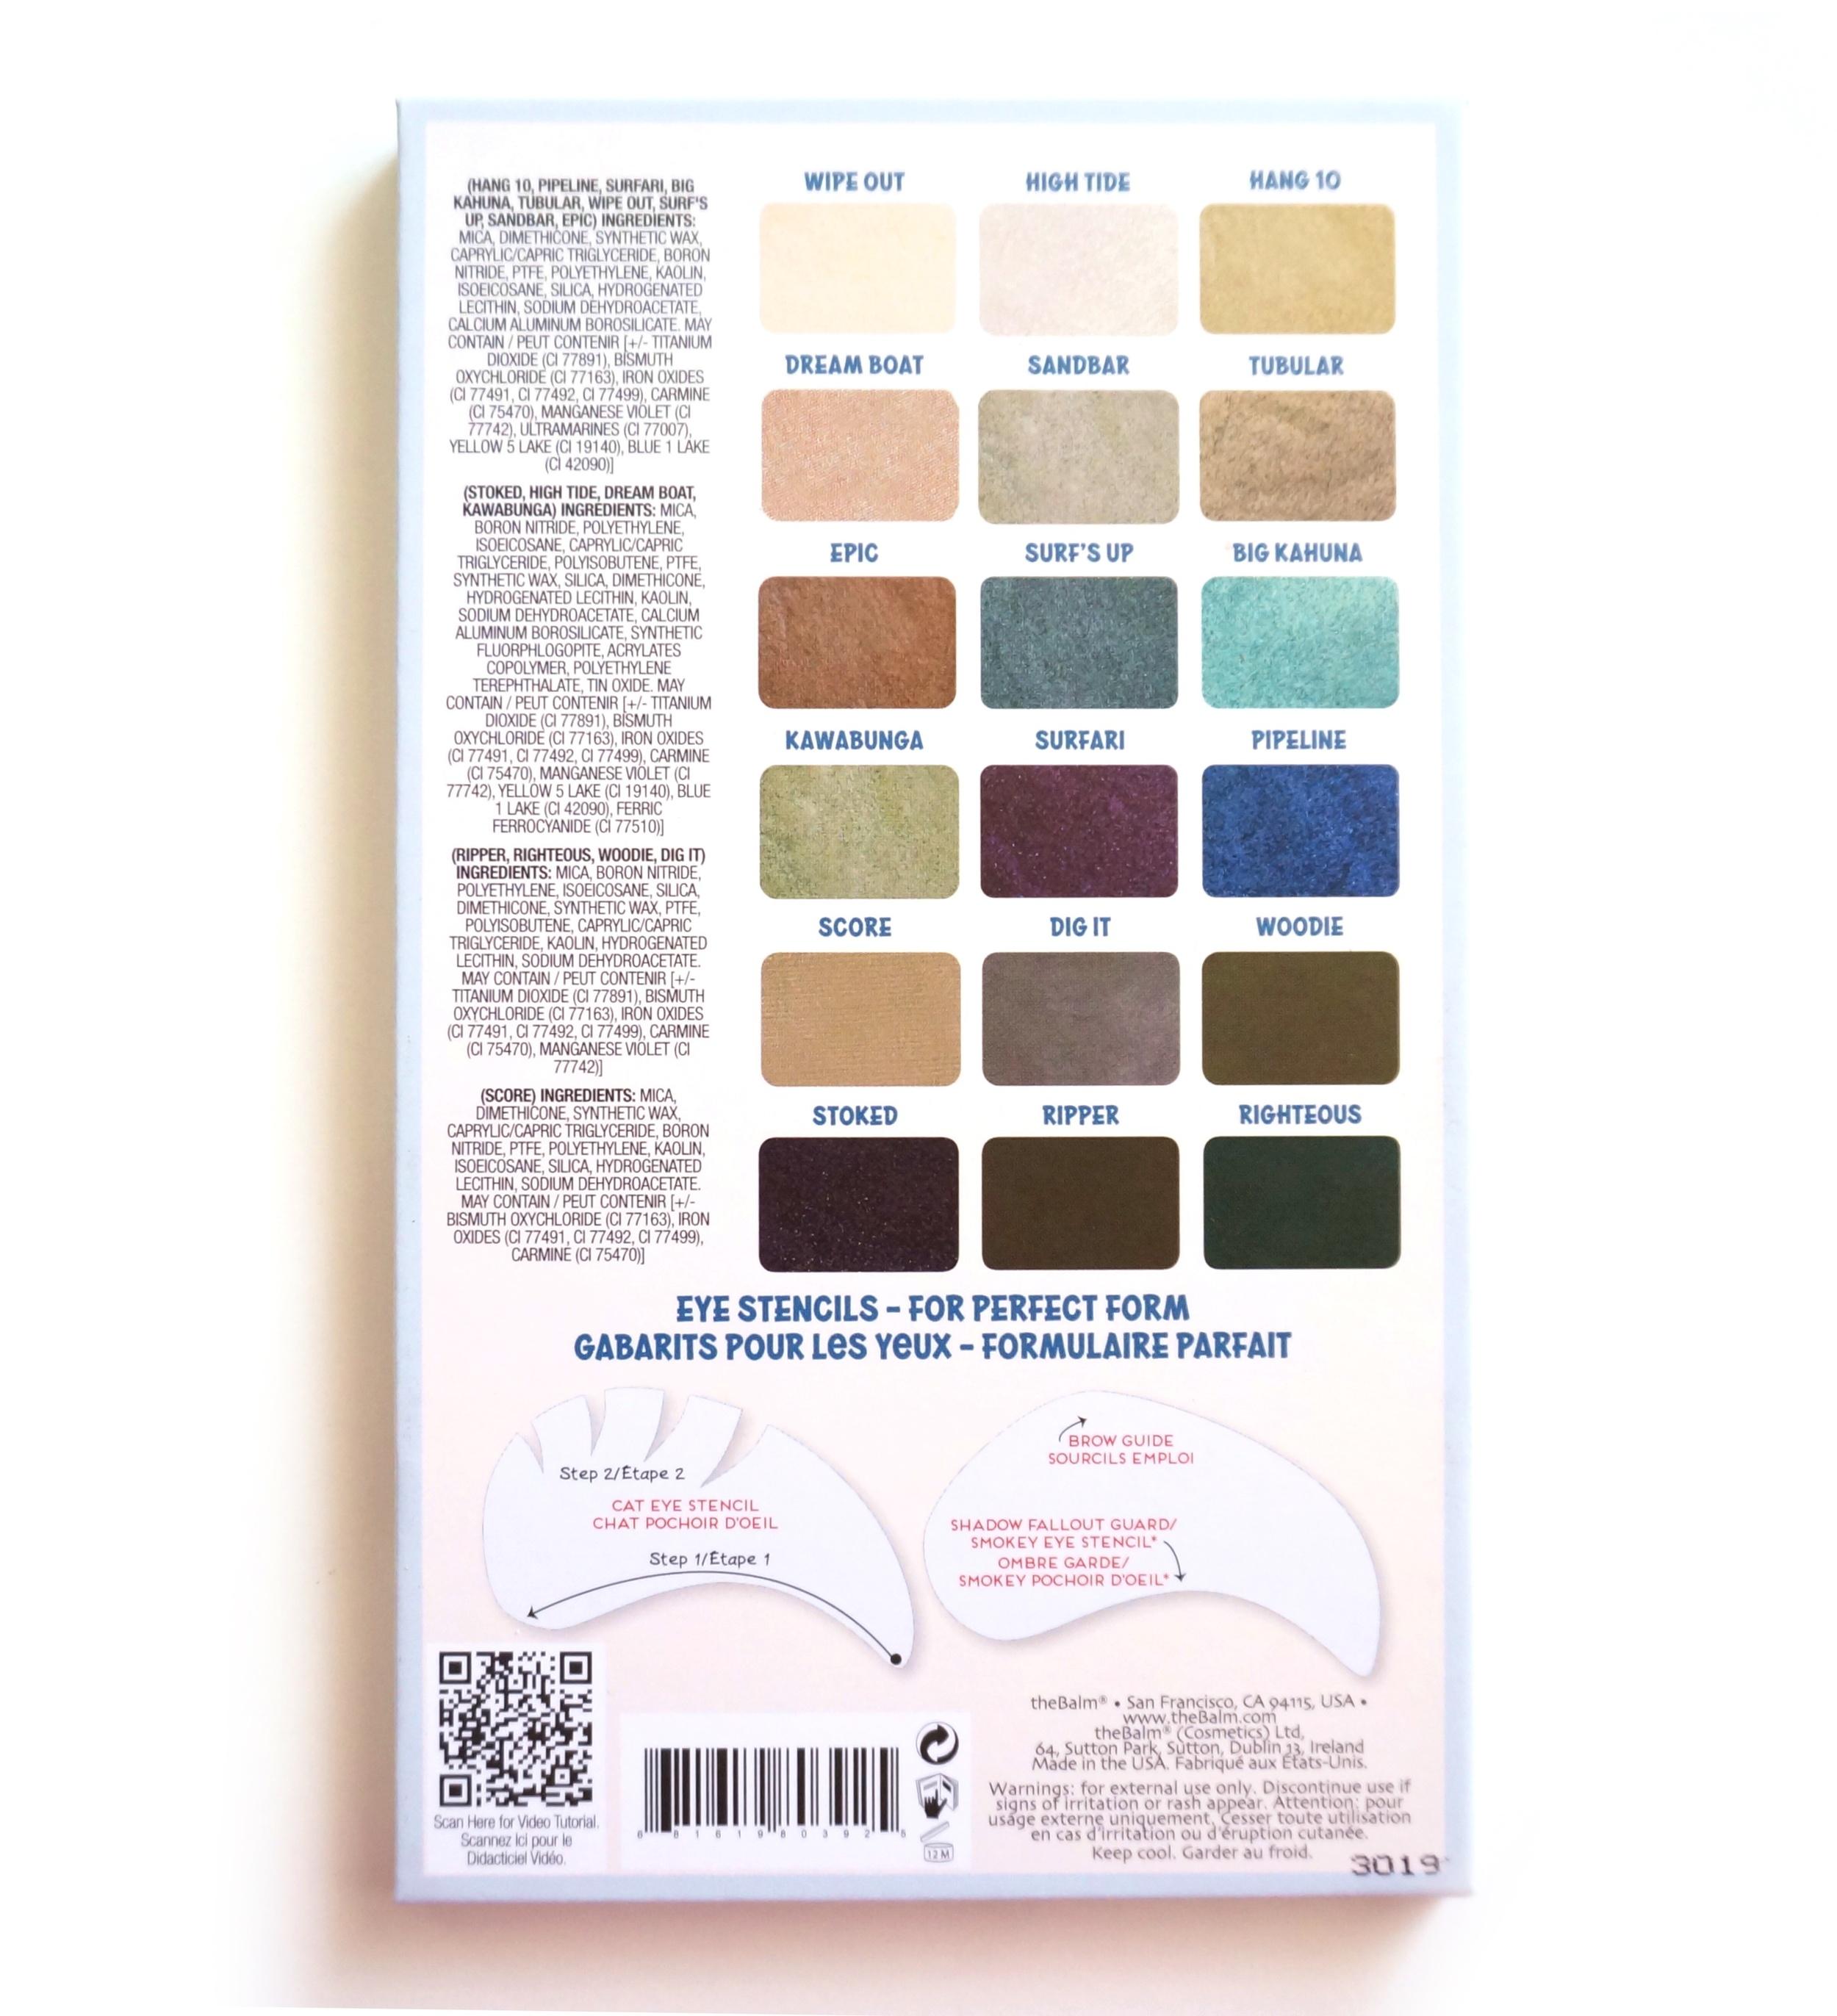 TheBalm Balmsai Palette Swatches